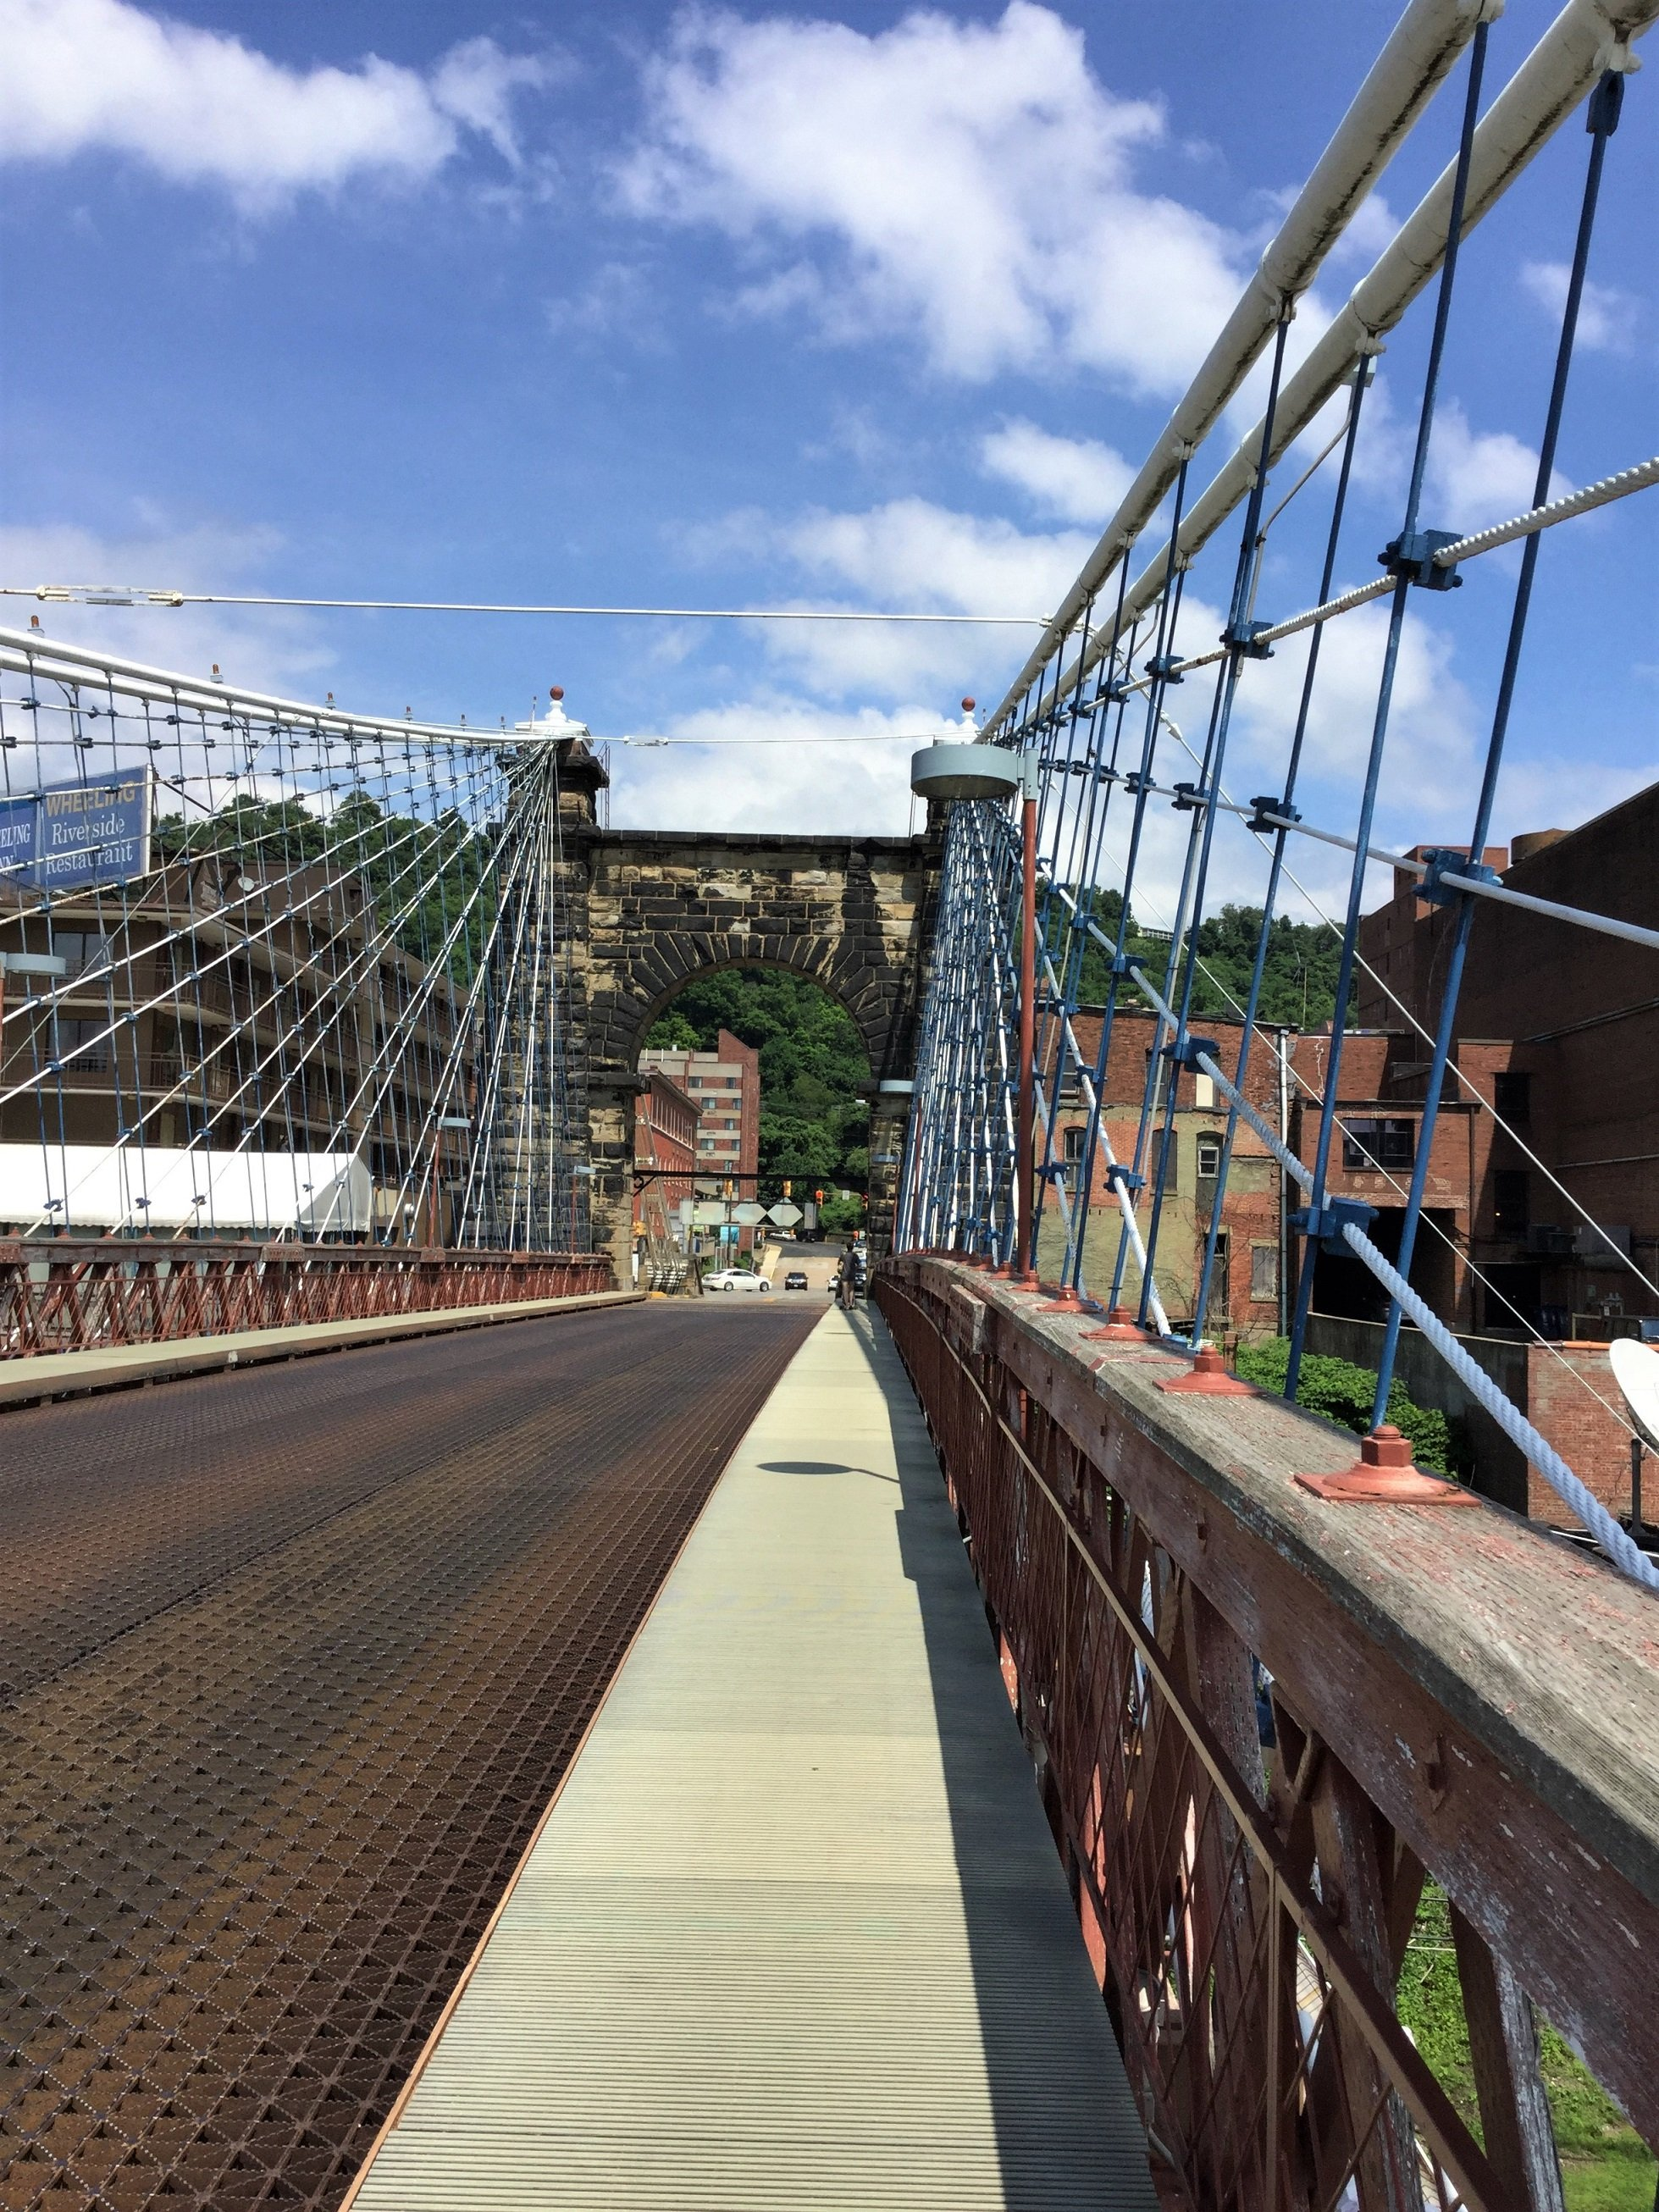 Walking the suspension bridge from Wheeling Island to the city of Wheeling.